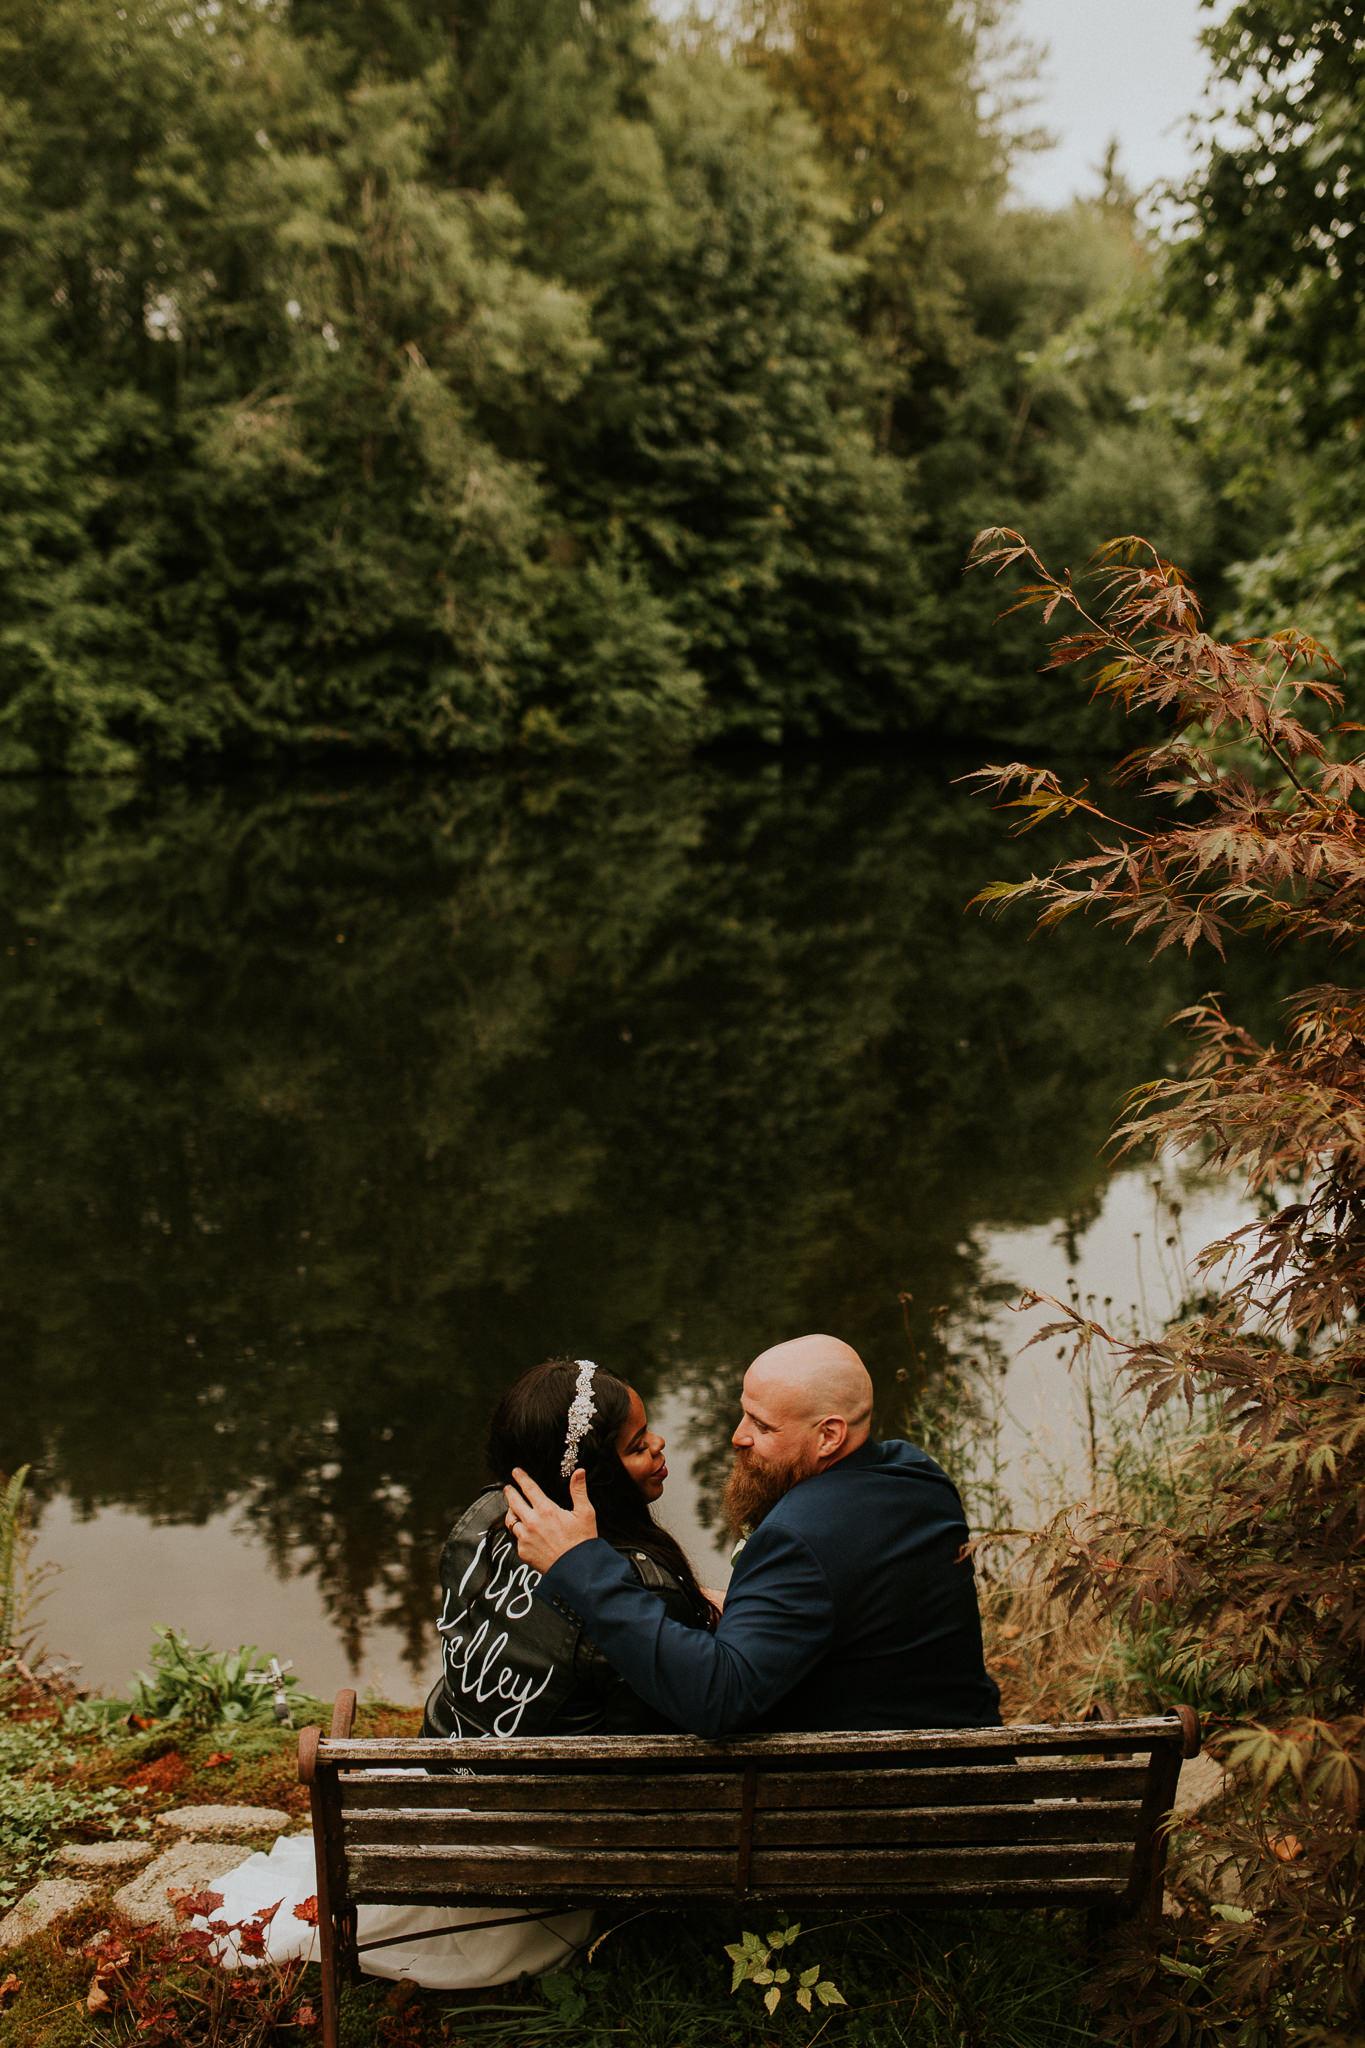 Lakeside-elopement-teasers-29.jpg